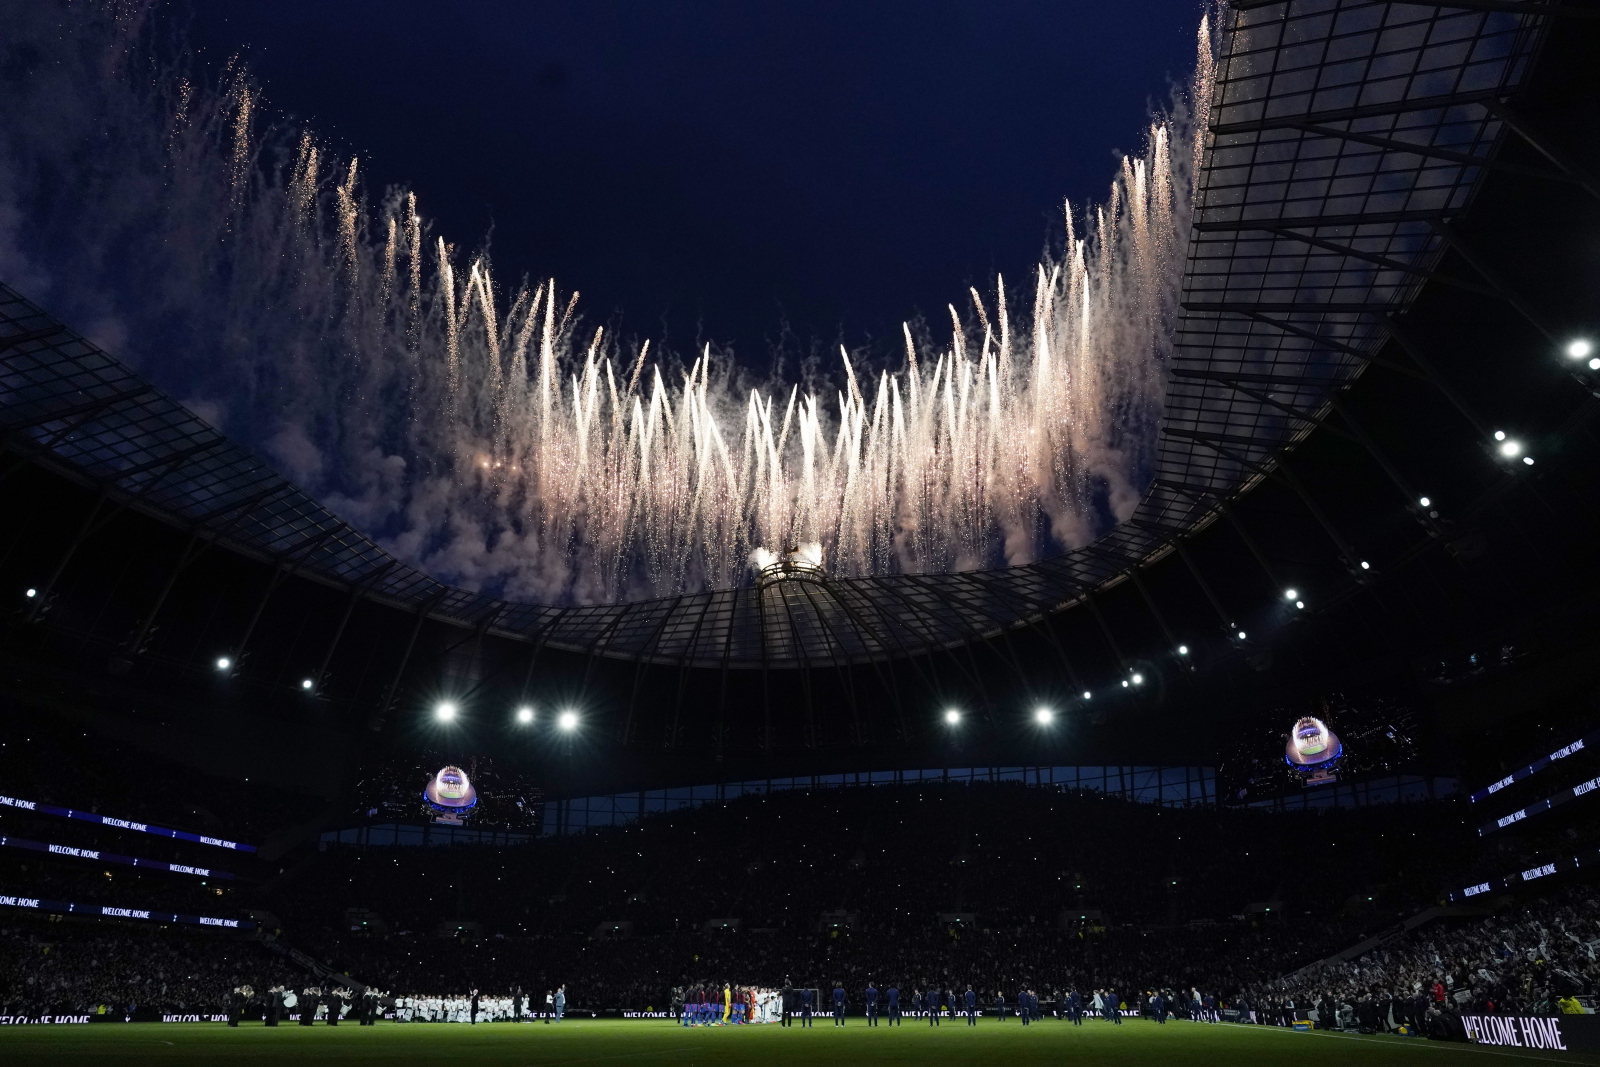 Tottenham Hotspur Stadium w Londynie. Fot. PAP/EPA/WILL OLIVER